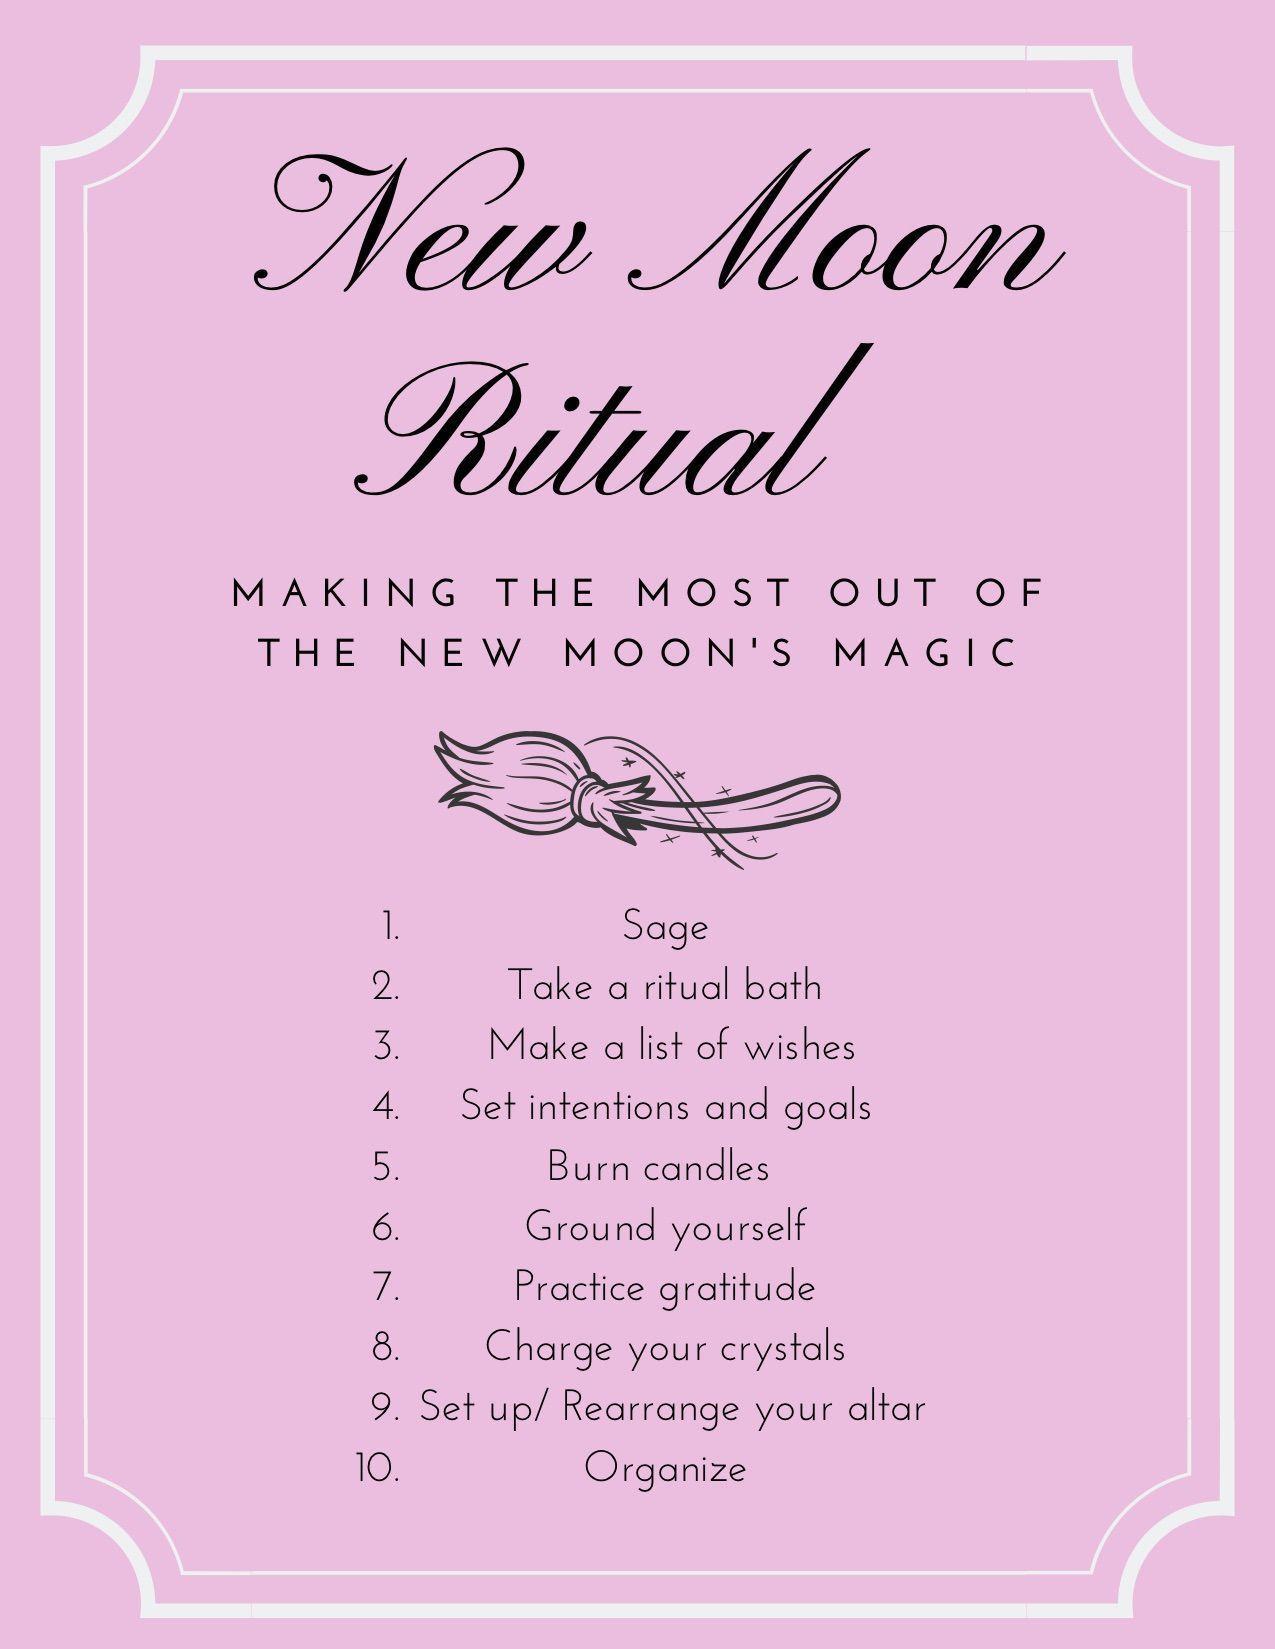 New Moon Ritual #newmoonritual How to do a New Moon Ritual #newmoonritual New Moon Ritual #newmoonritual How to do a New Moon Ritual #newmoonritual